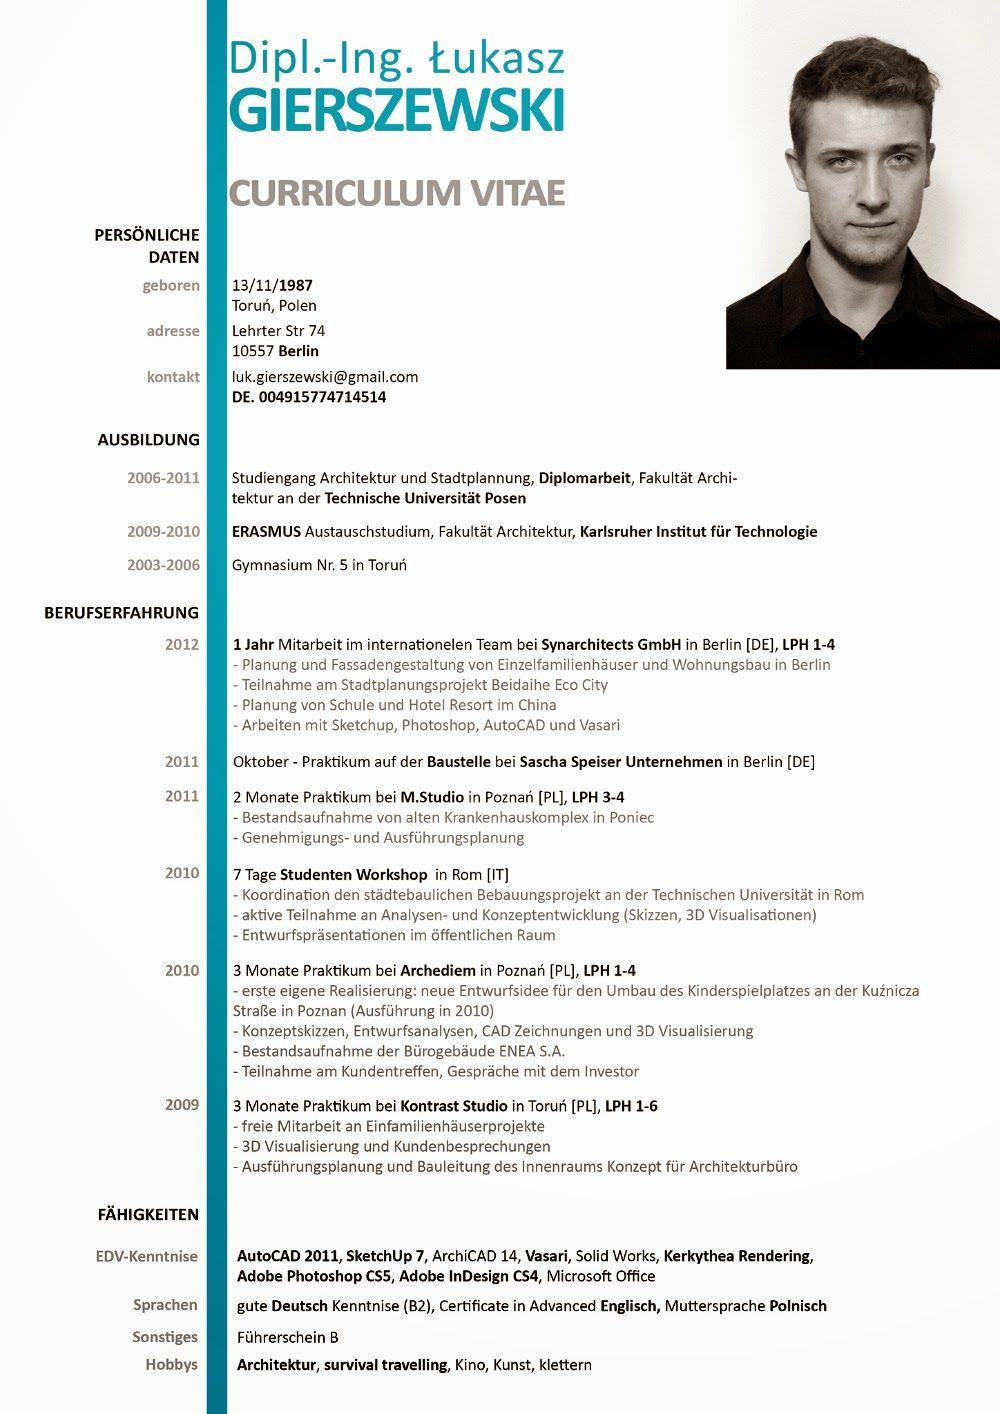 Kinesiologo Modelos de curriculum vitae, Curriculum